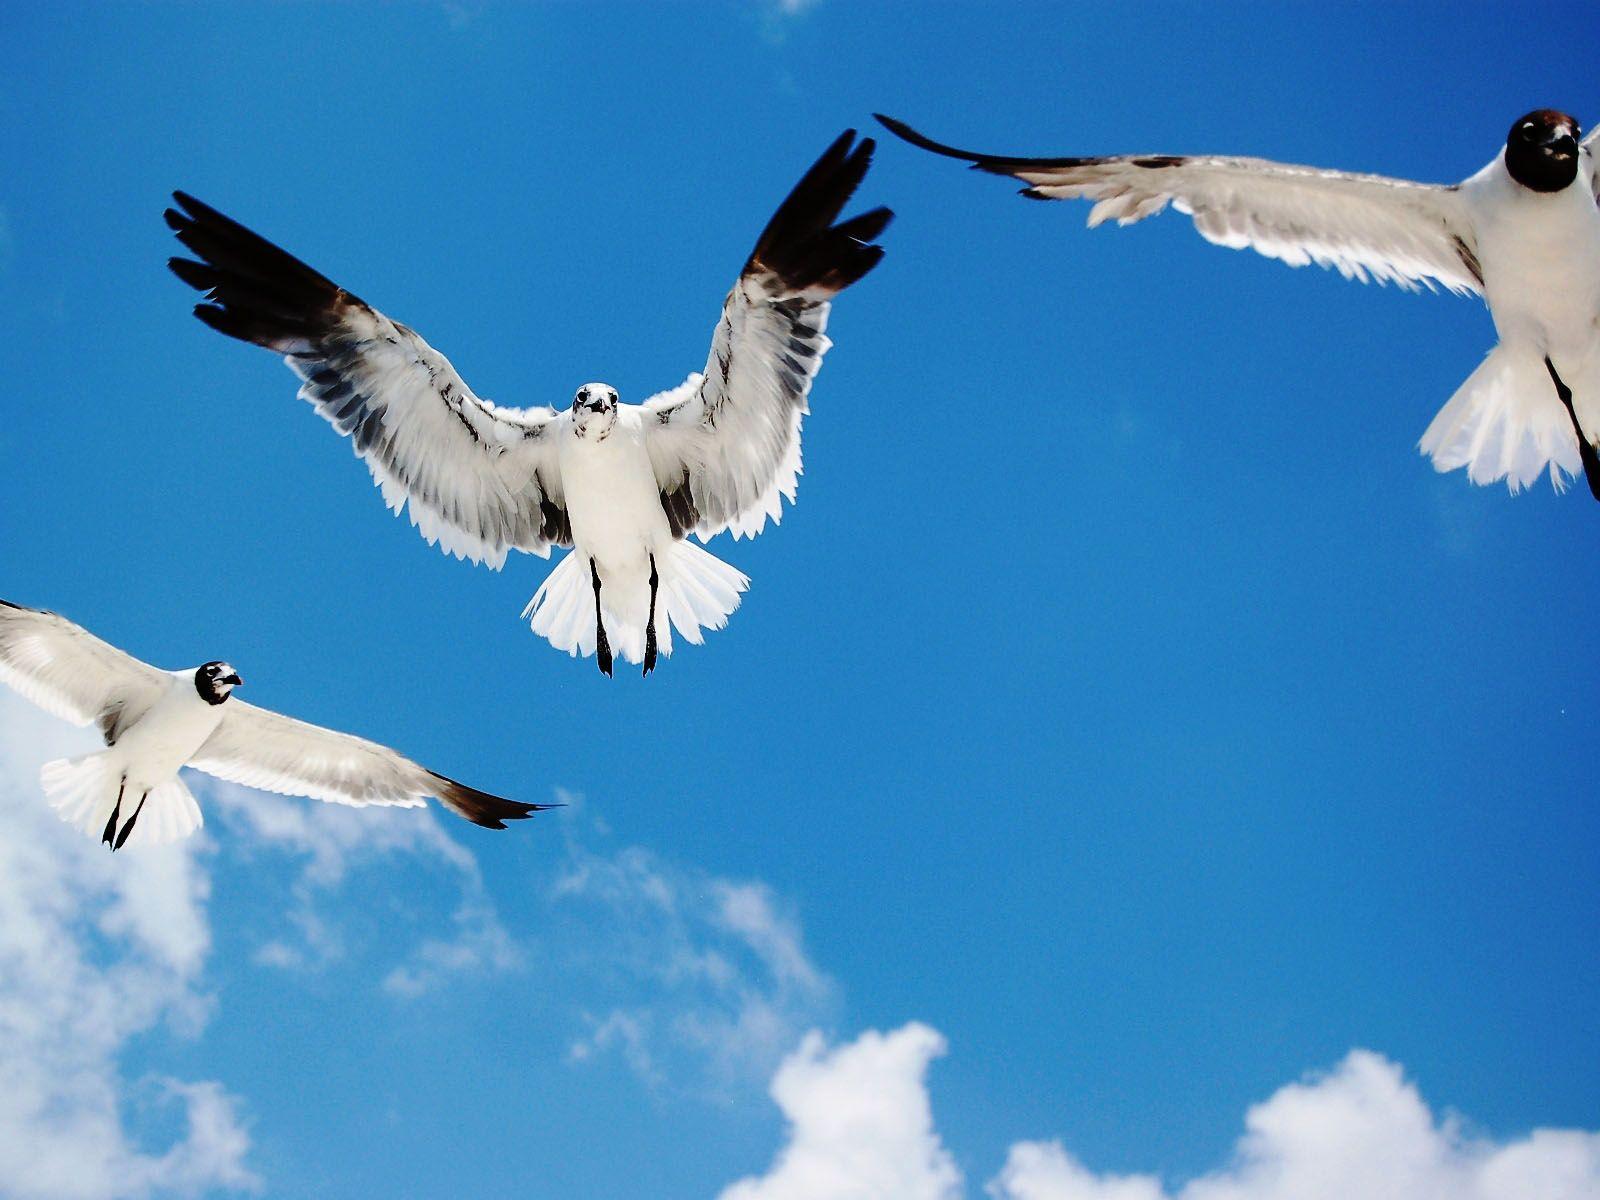 Birds Flying In The Sky Wallpaper 1600x1200